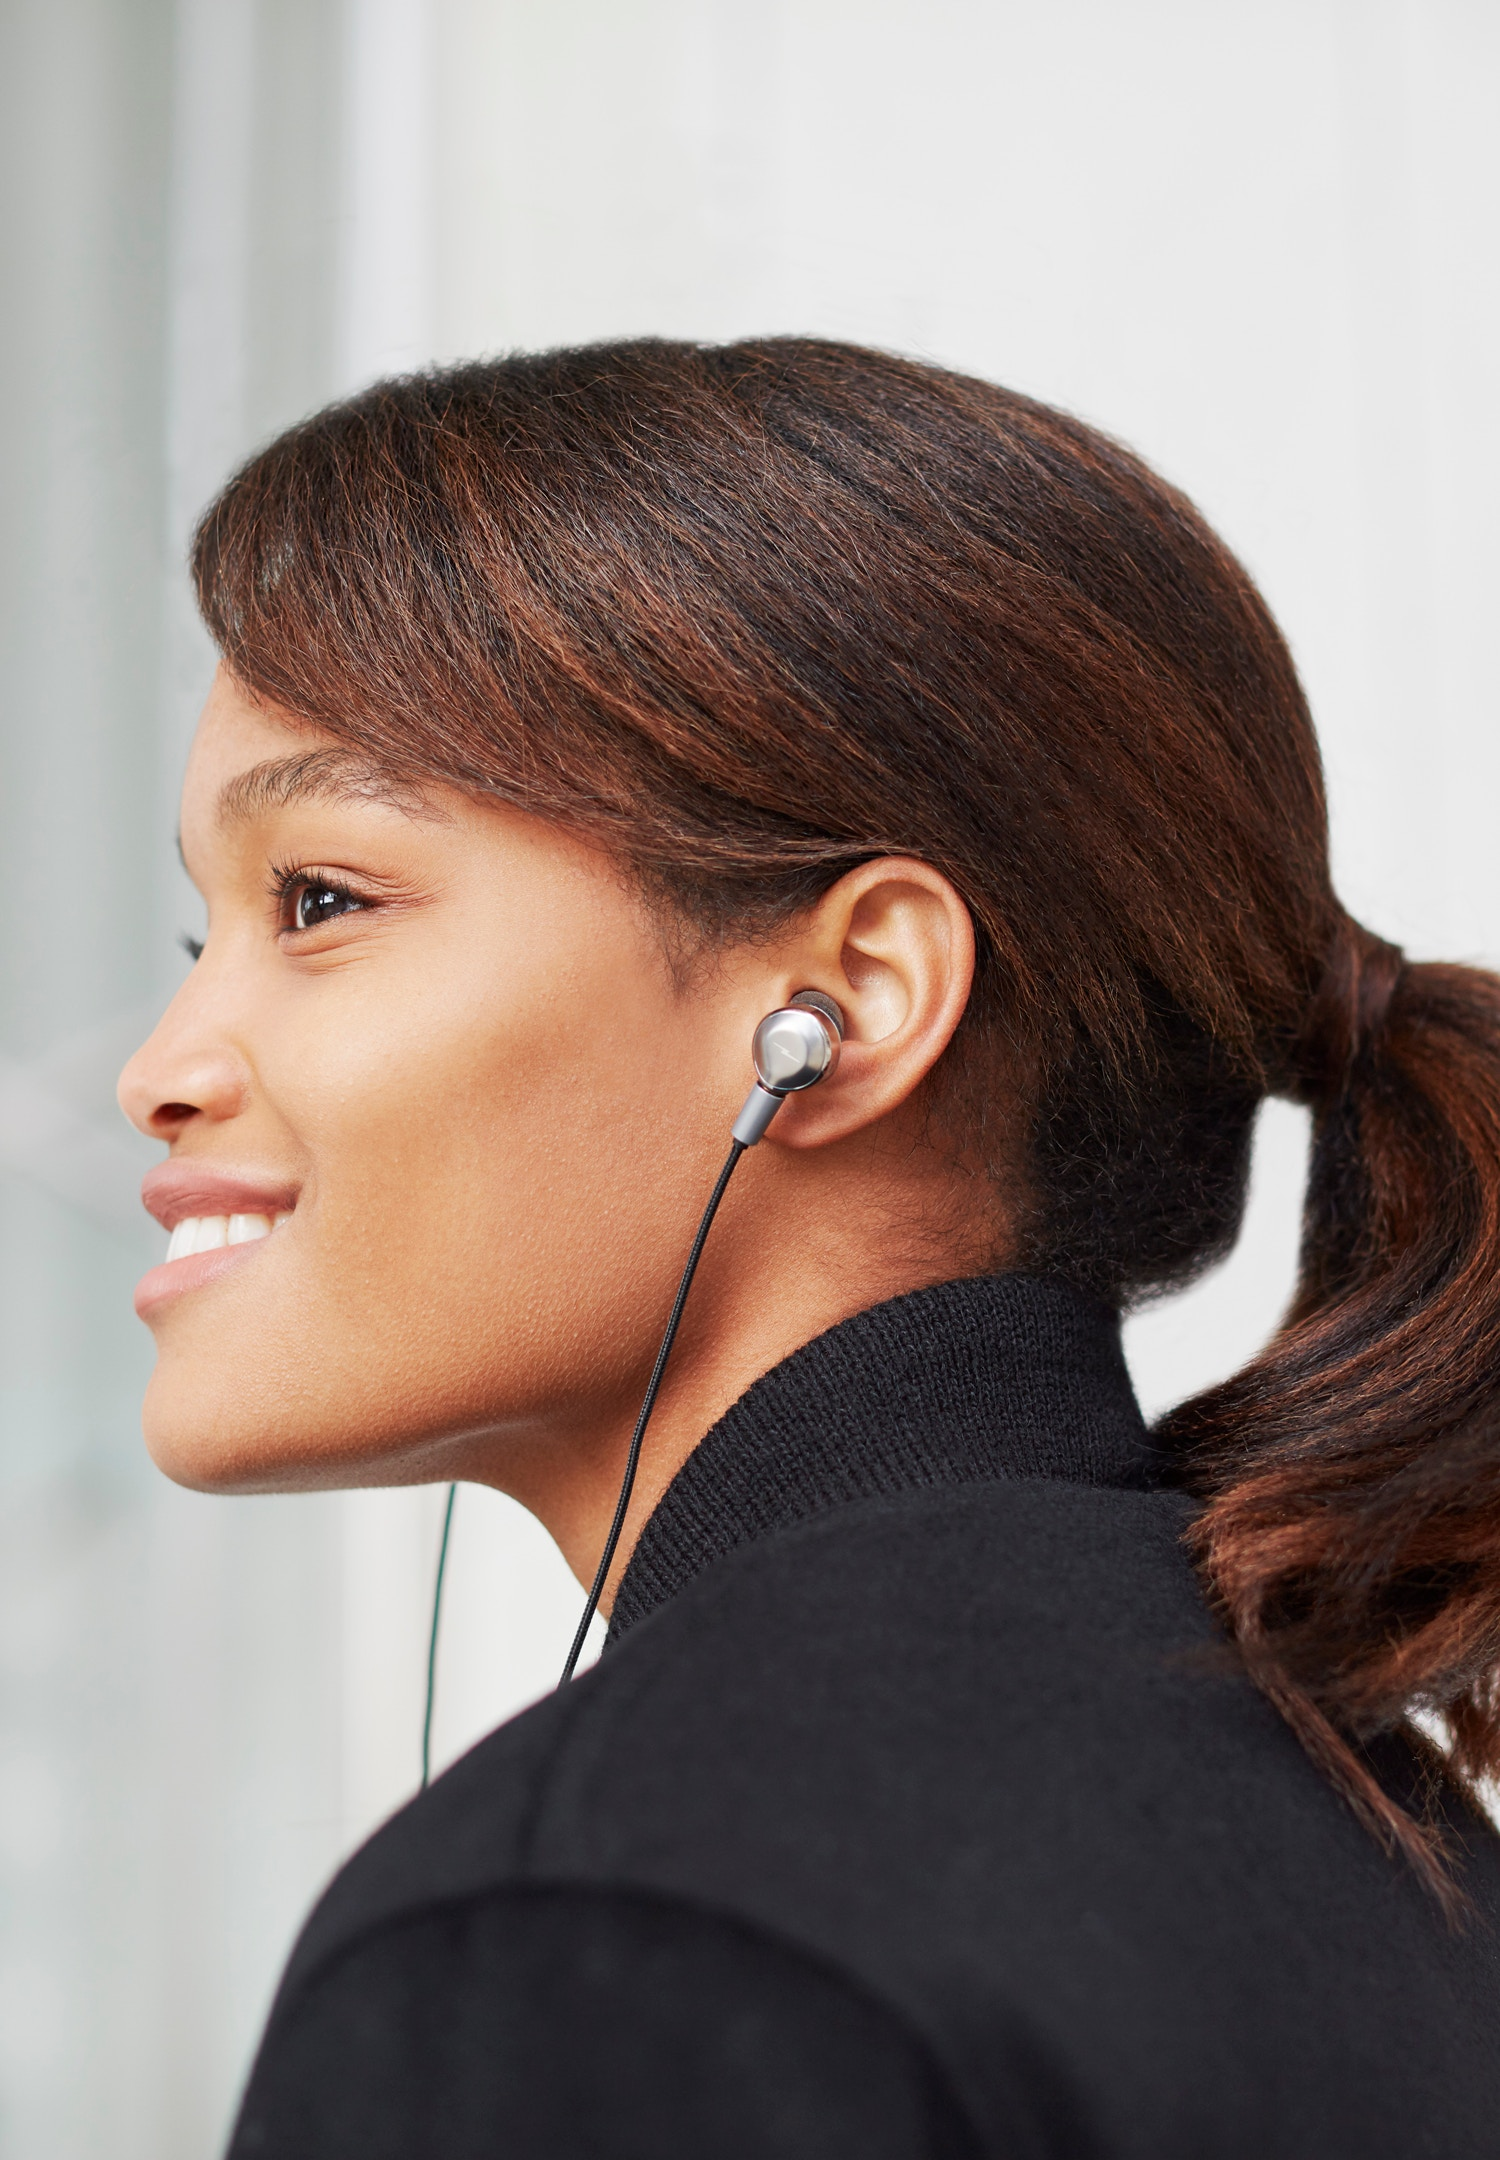 s4220090631_headphones_inear_silver_02_1500x2160.jpeg